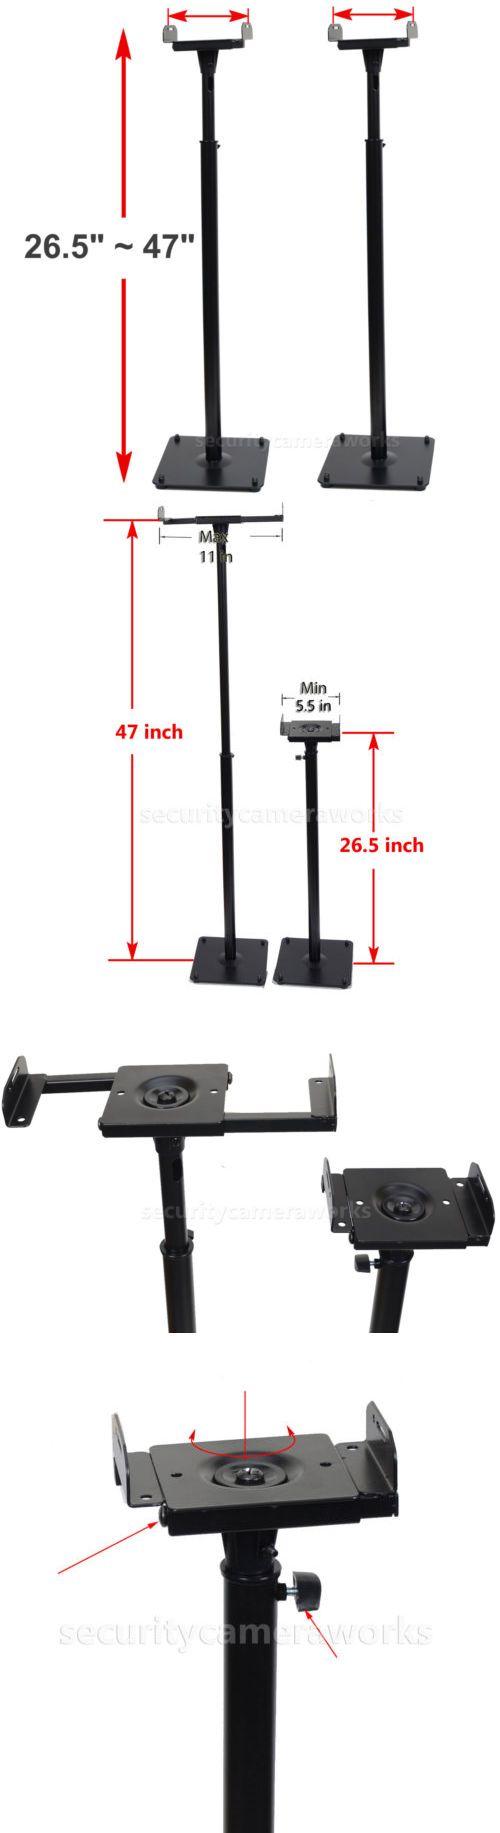 Speaker Mounts and Stands: 2 Surround Sound Bookshelf Floor Speaker Stands Side Clamp Heavy Duty Mounts Bjr BUY IT NOW ONLY: $48.7